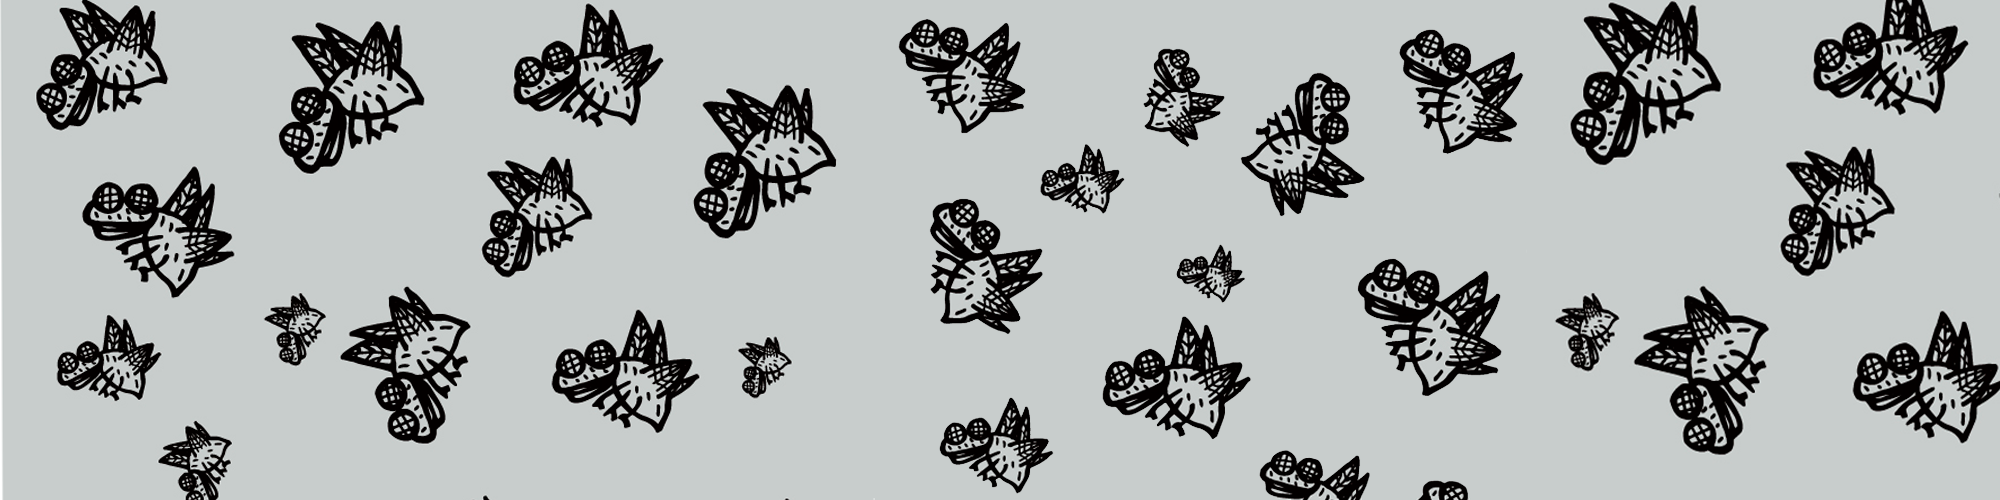 Mahcabra-moscas